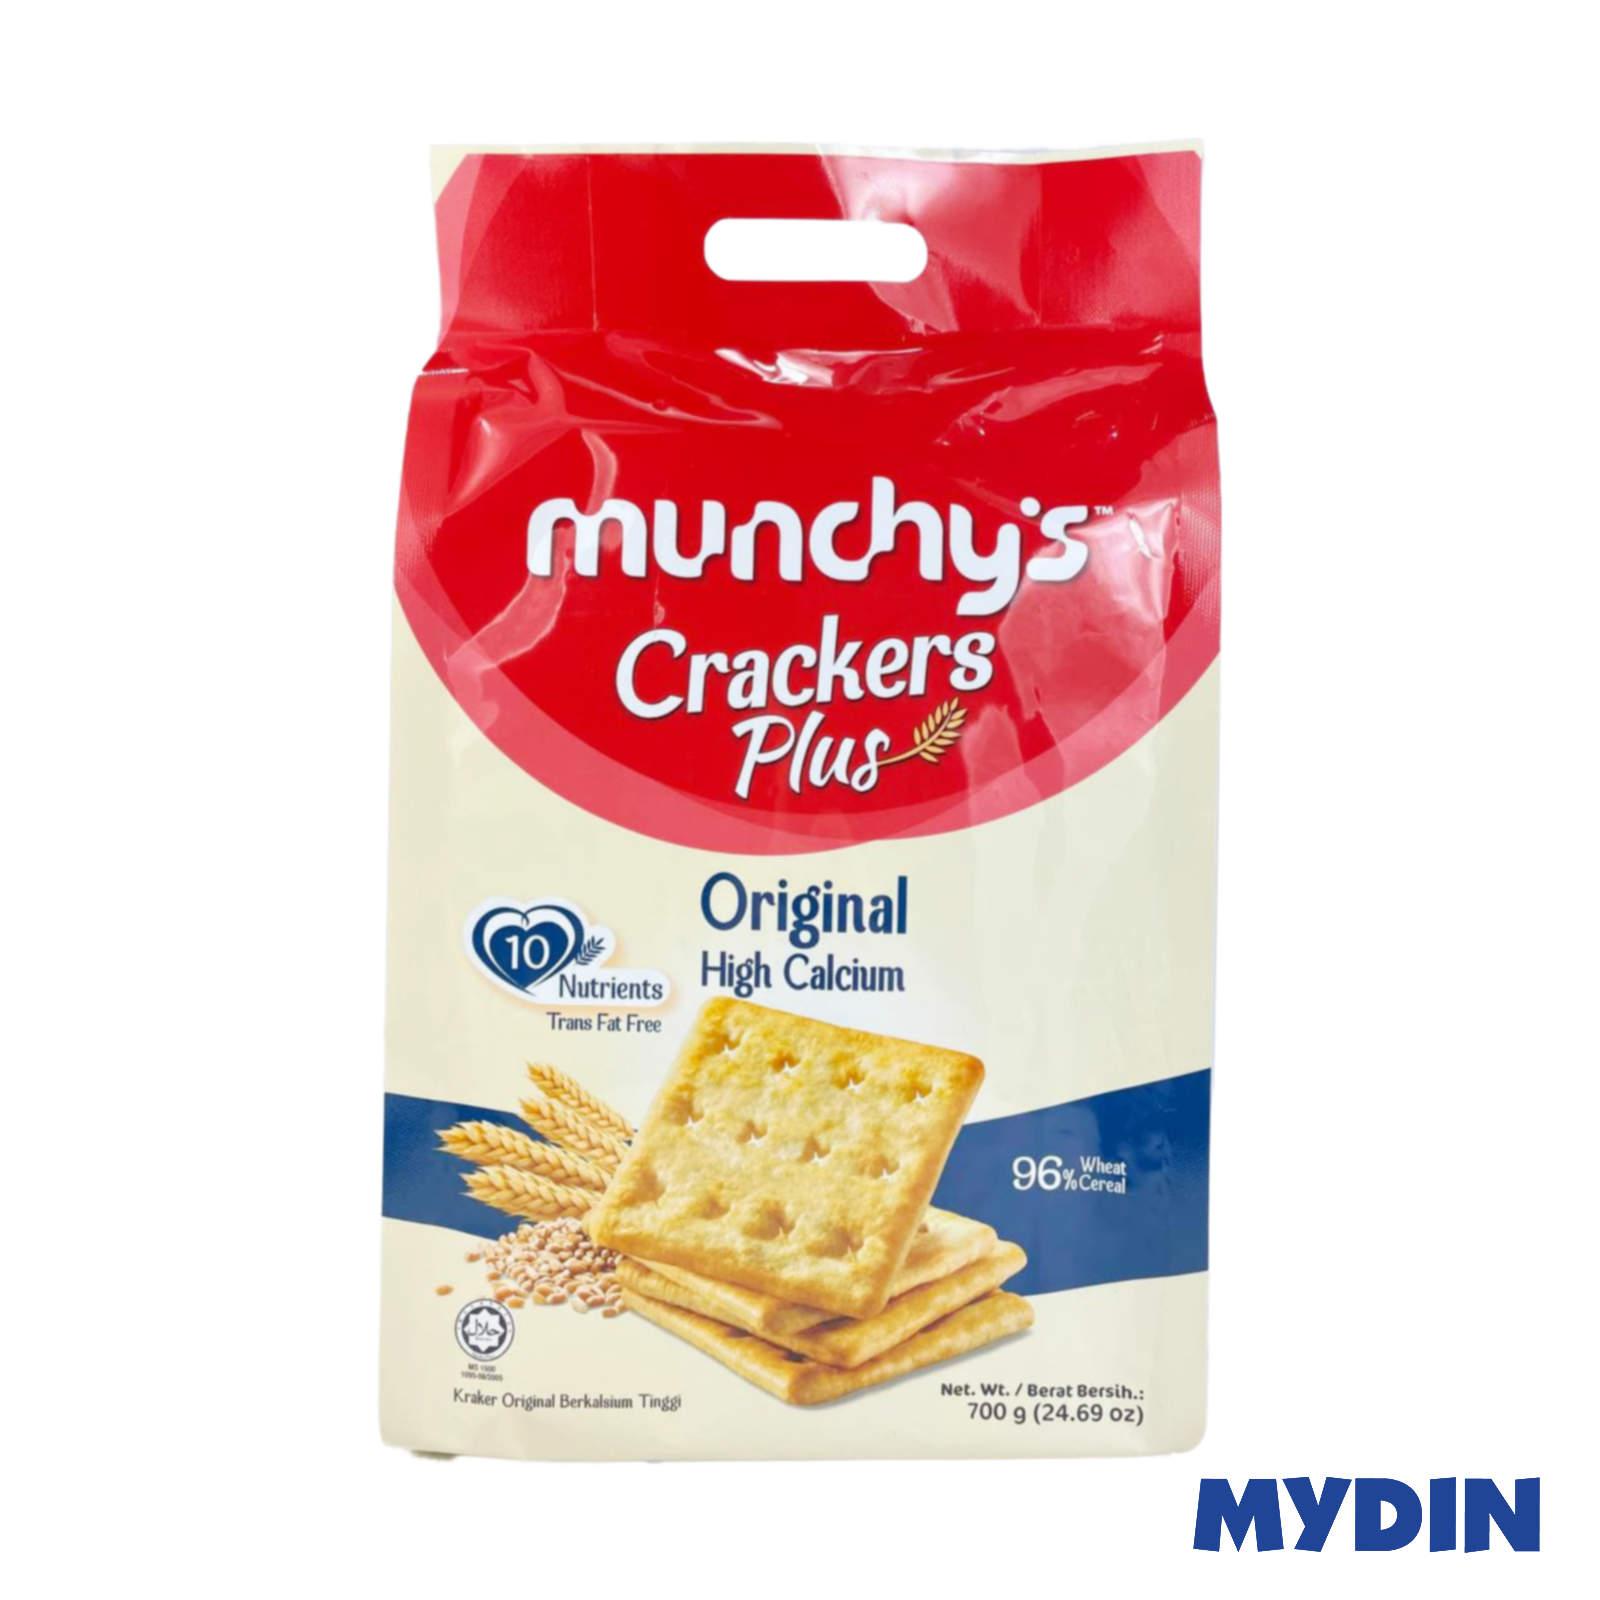 Munchy's Cracker Plus Original High Calsium 700g